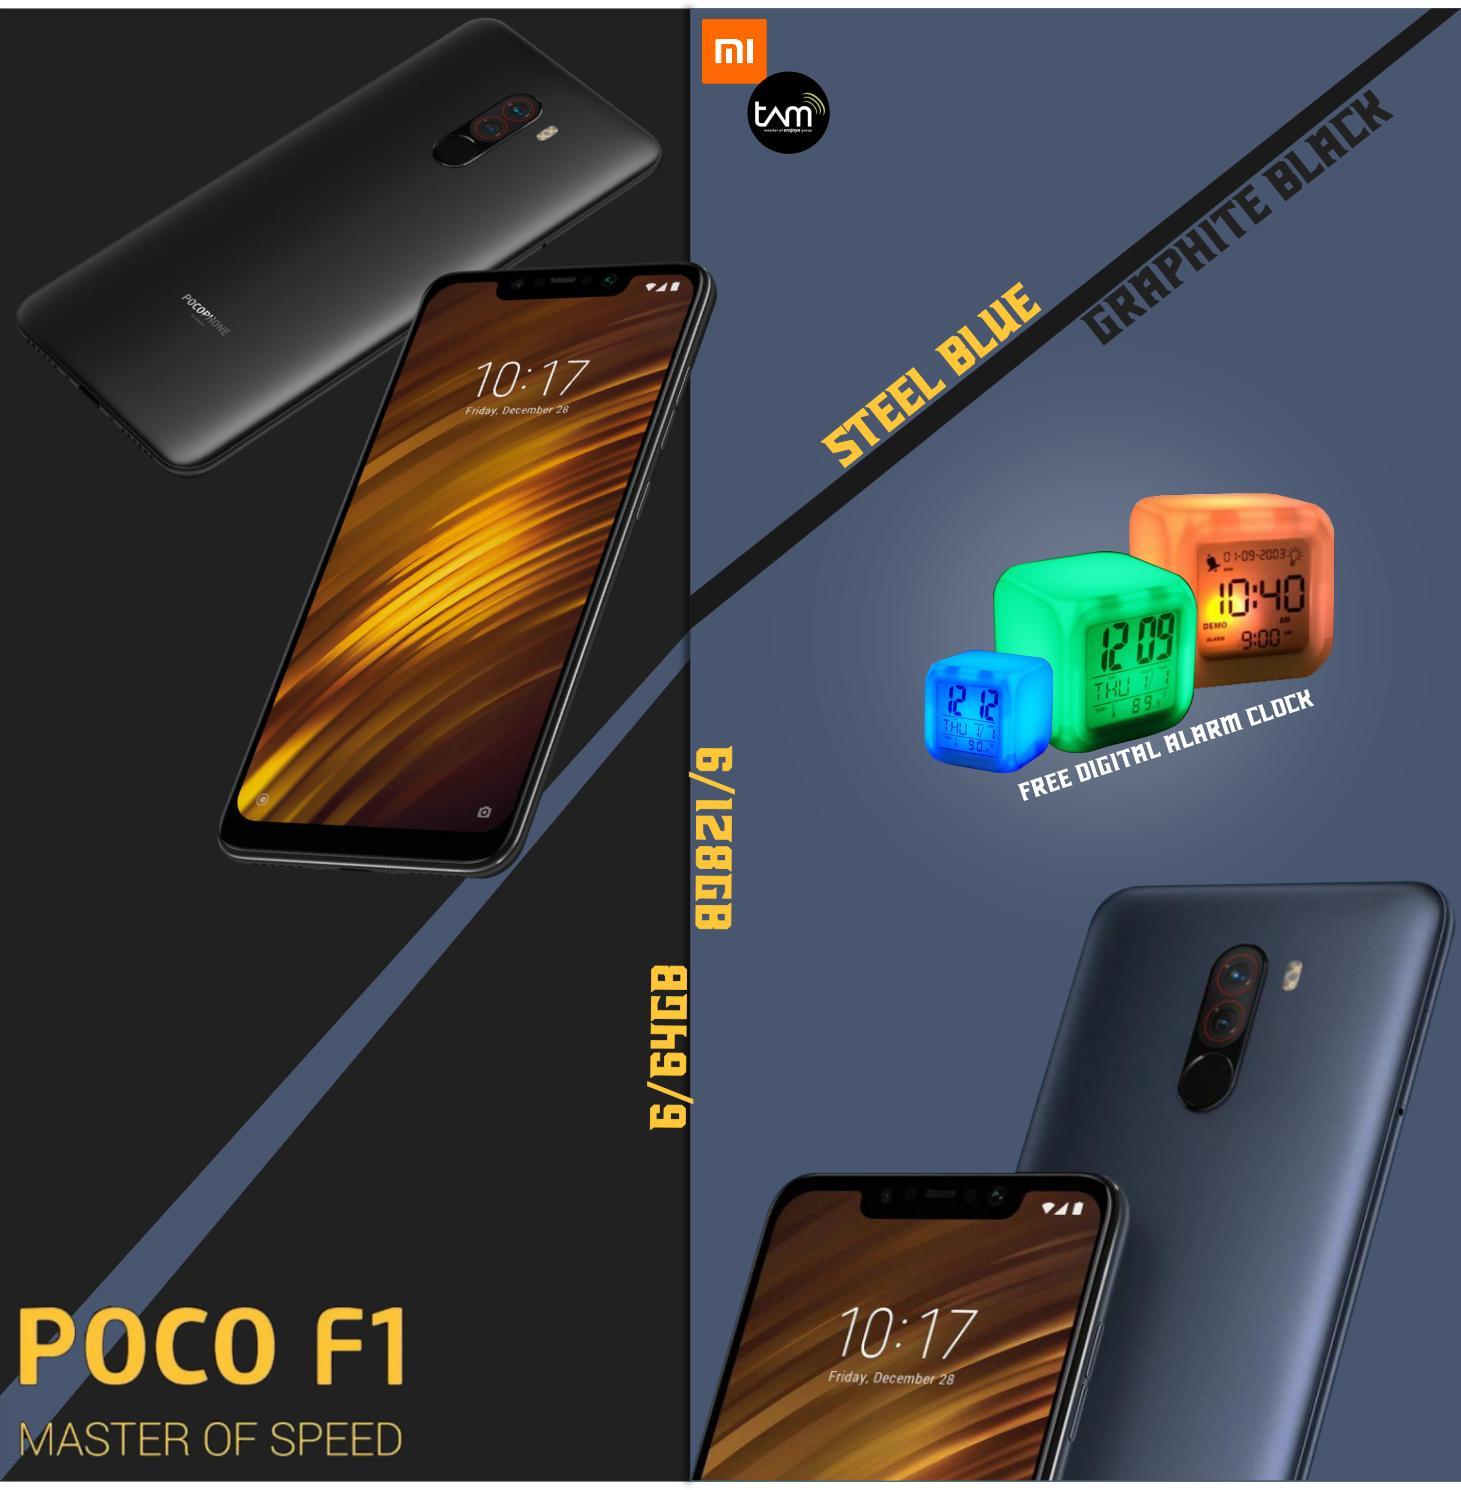 Xiaomi Pocophone F1 6/64GB Graphite Black Snapdragon 845 Garansi Resmi TAM free LED digital alarm clock